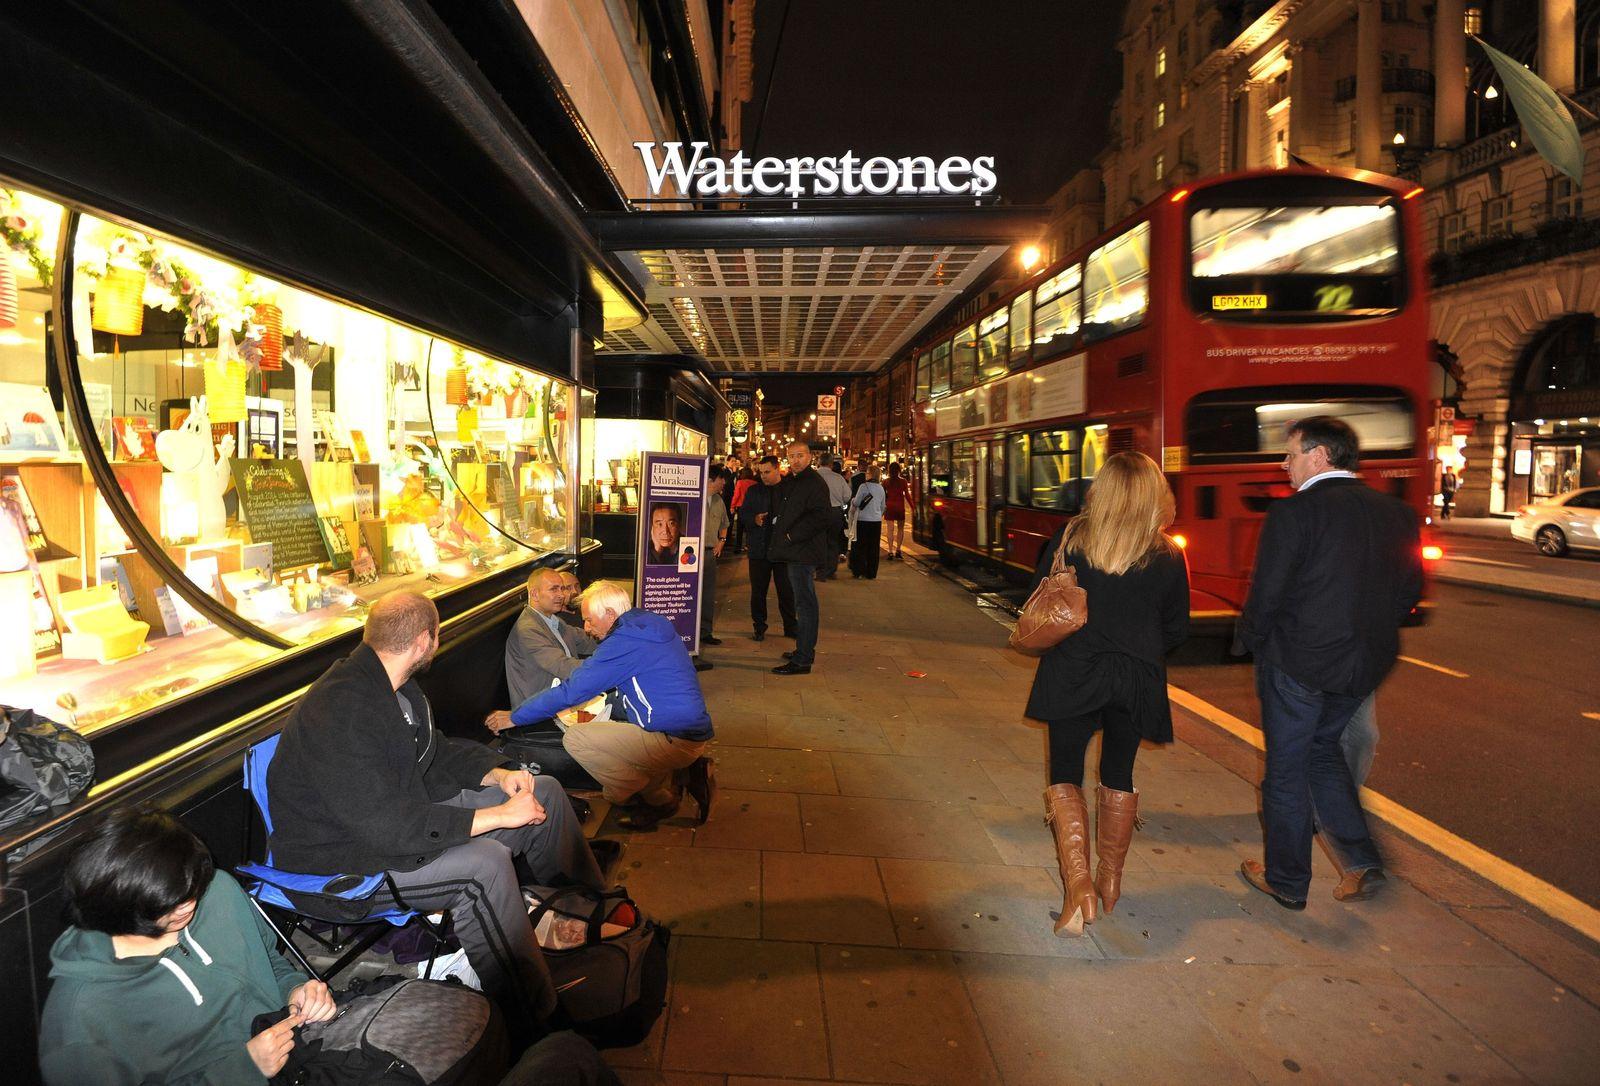 Waterstones/ Buchhandlung/ London